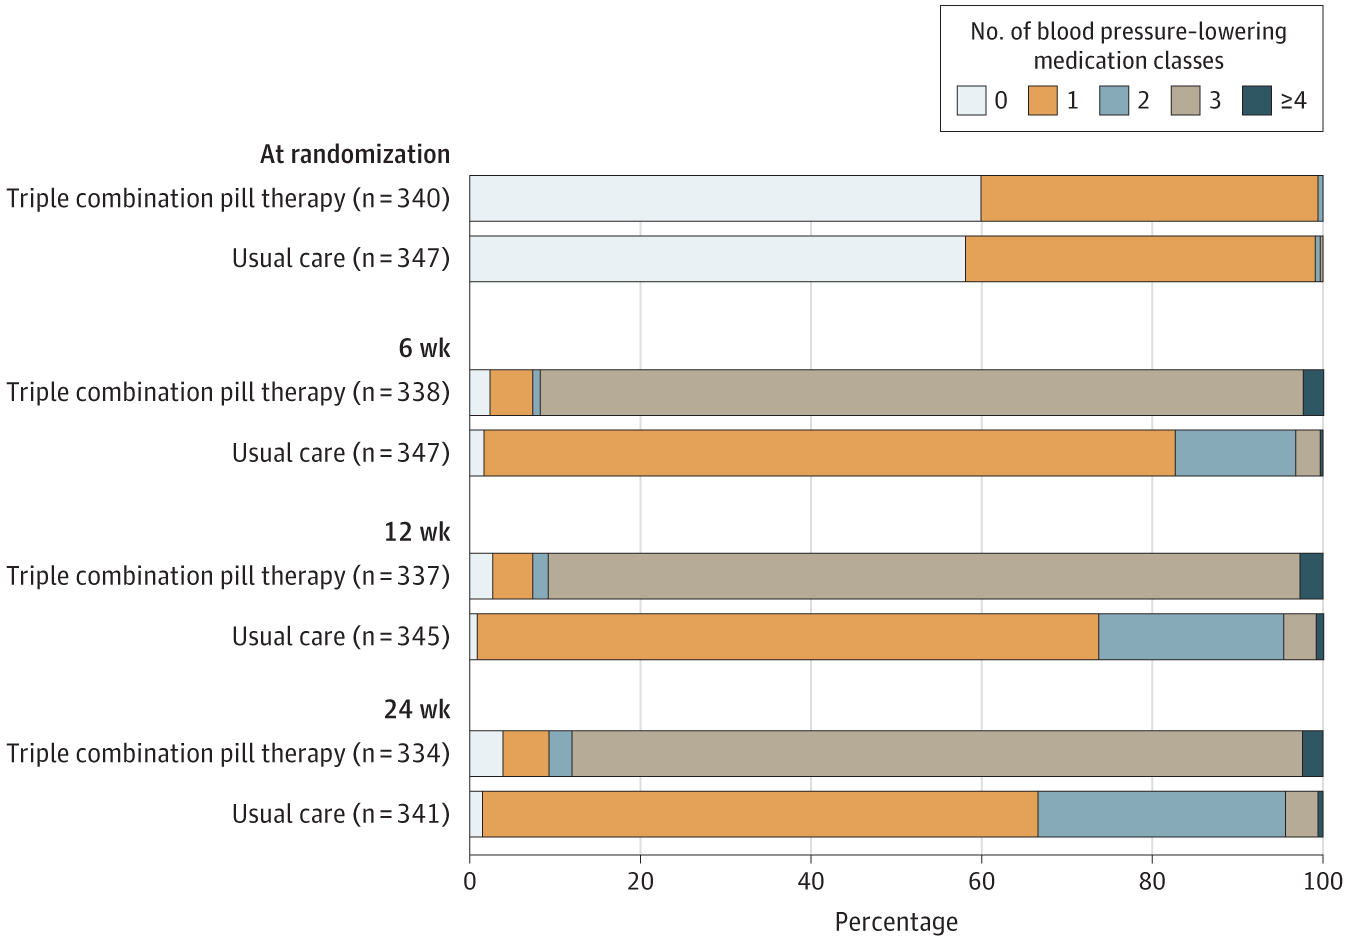 48dac21591 Fixed Low-Dose Triple Combination Antihypertensive Medication vs ...